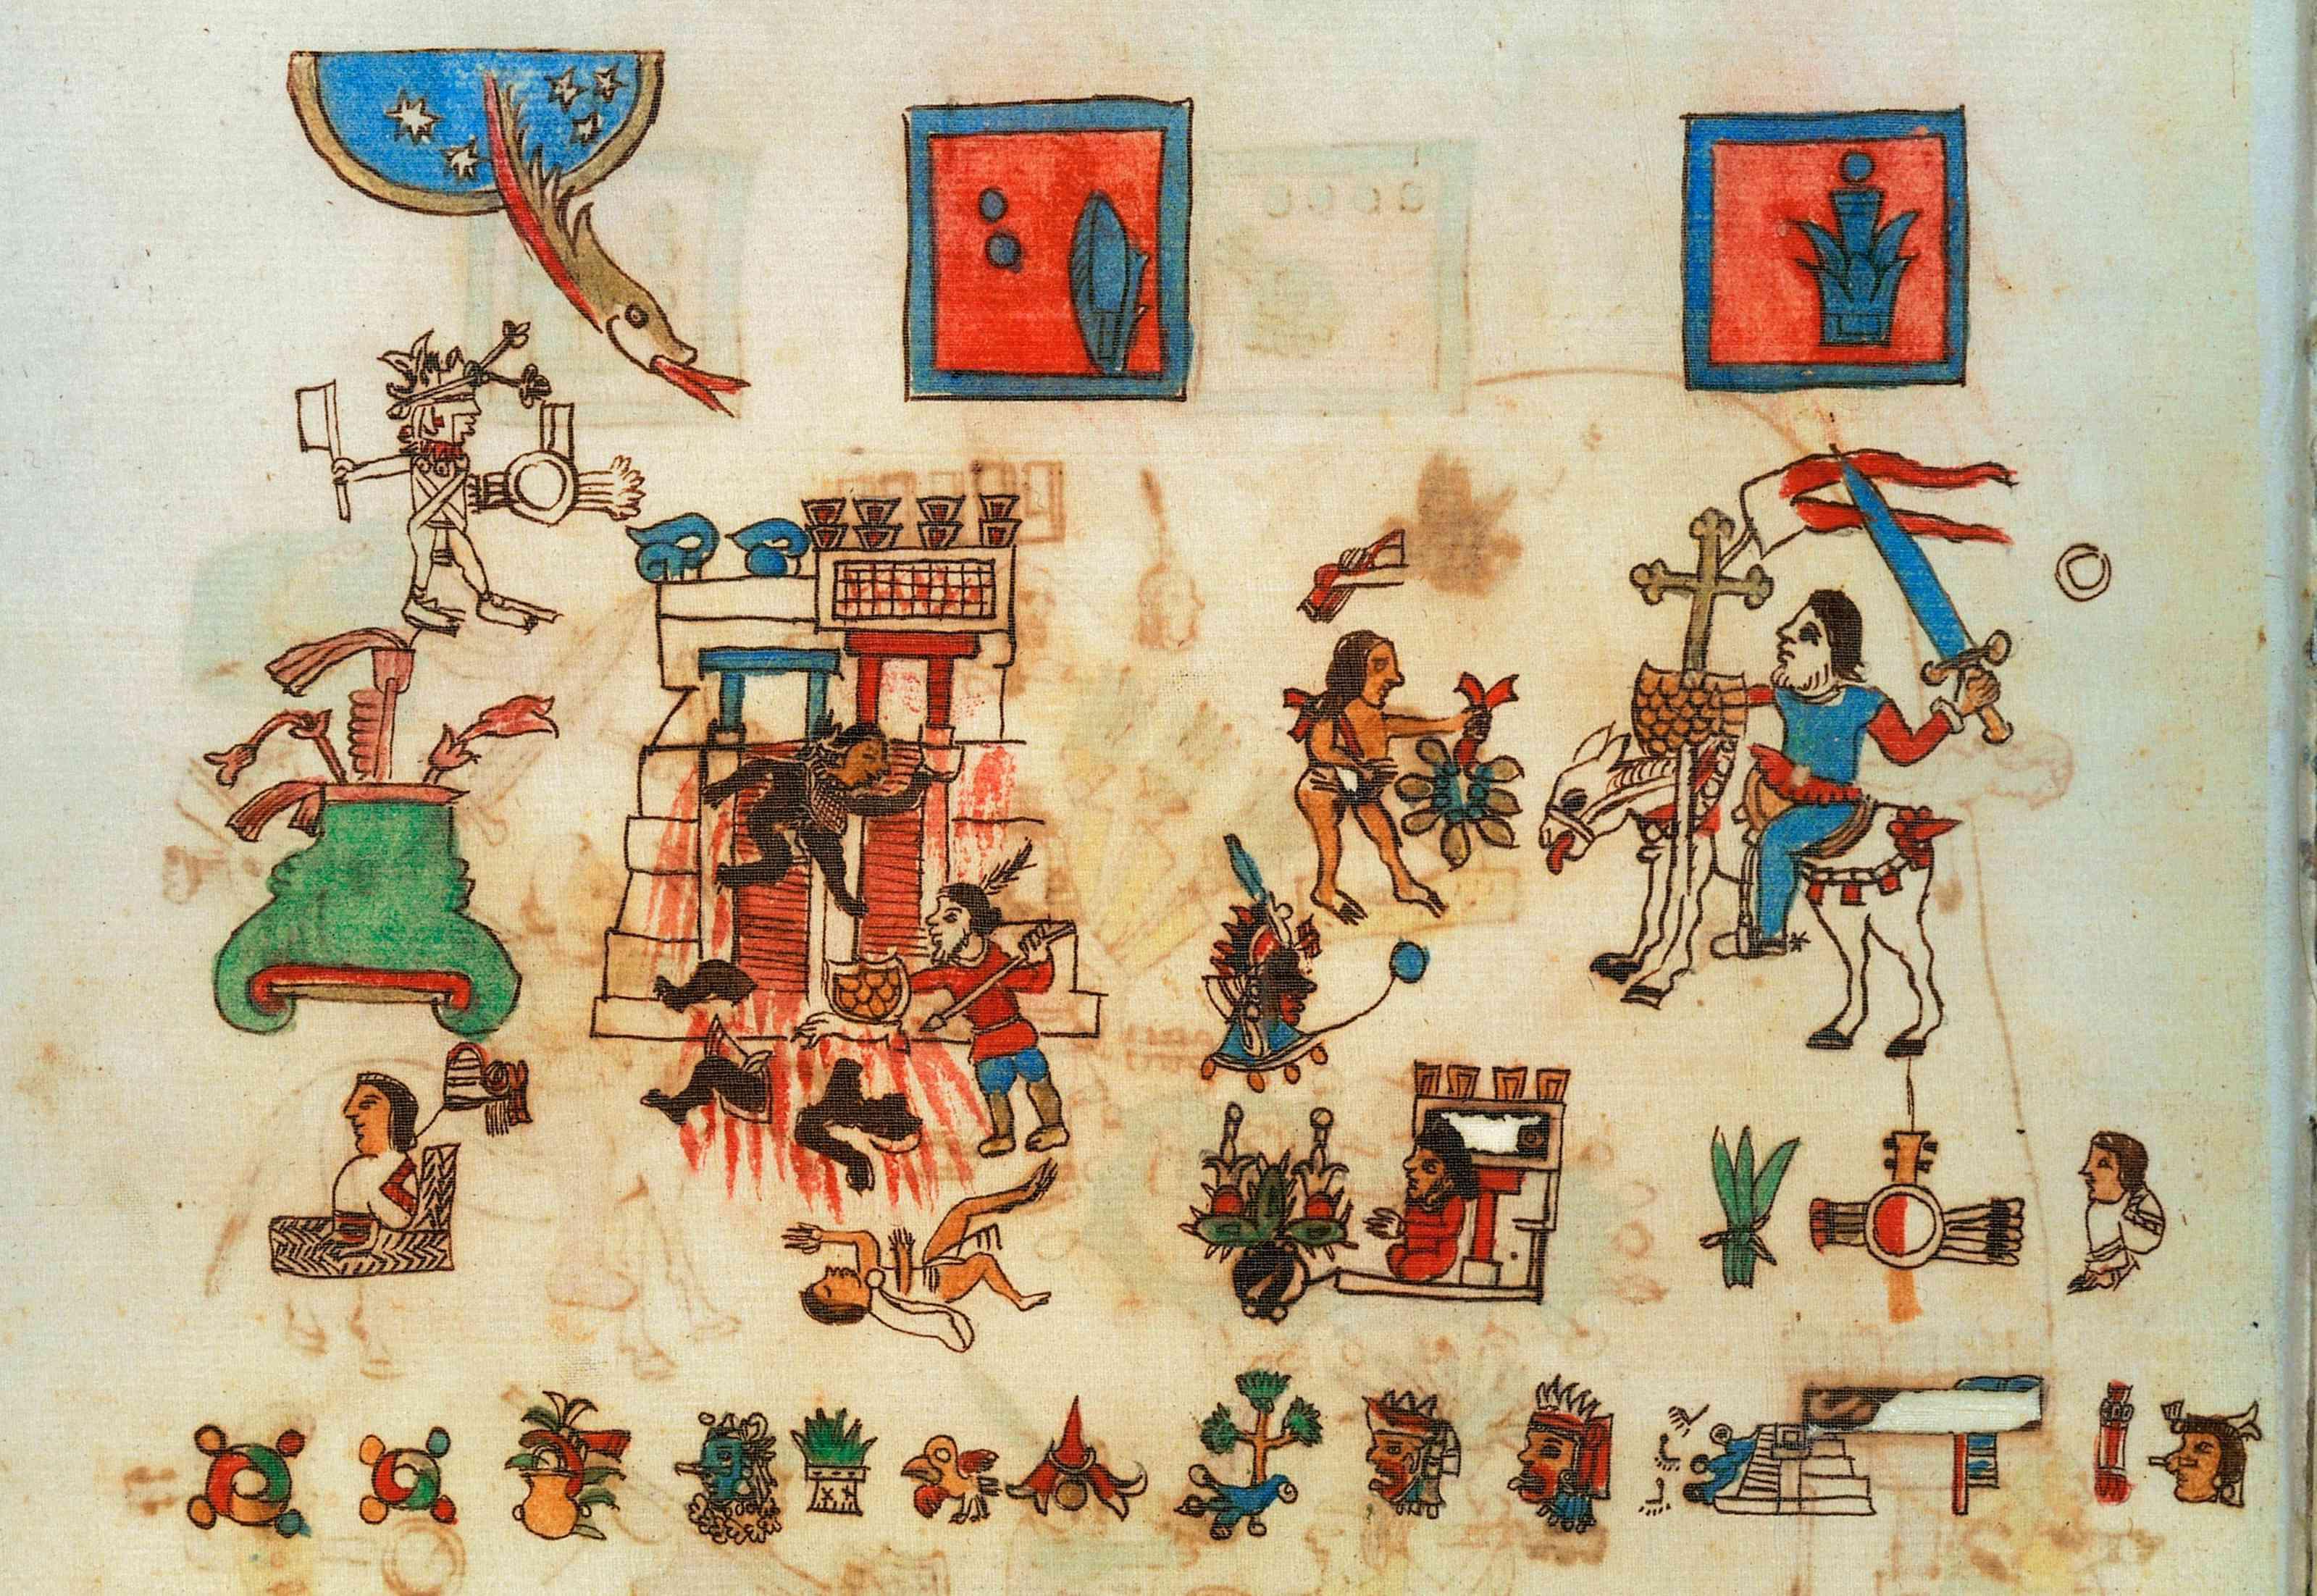 Hernan Cortes on horseback from the Manuscript Vaticanus A 3738 or Codex Rios, folio 87 recto, Mexico, Aztec civilizatio